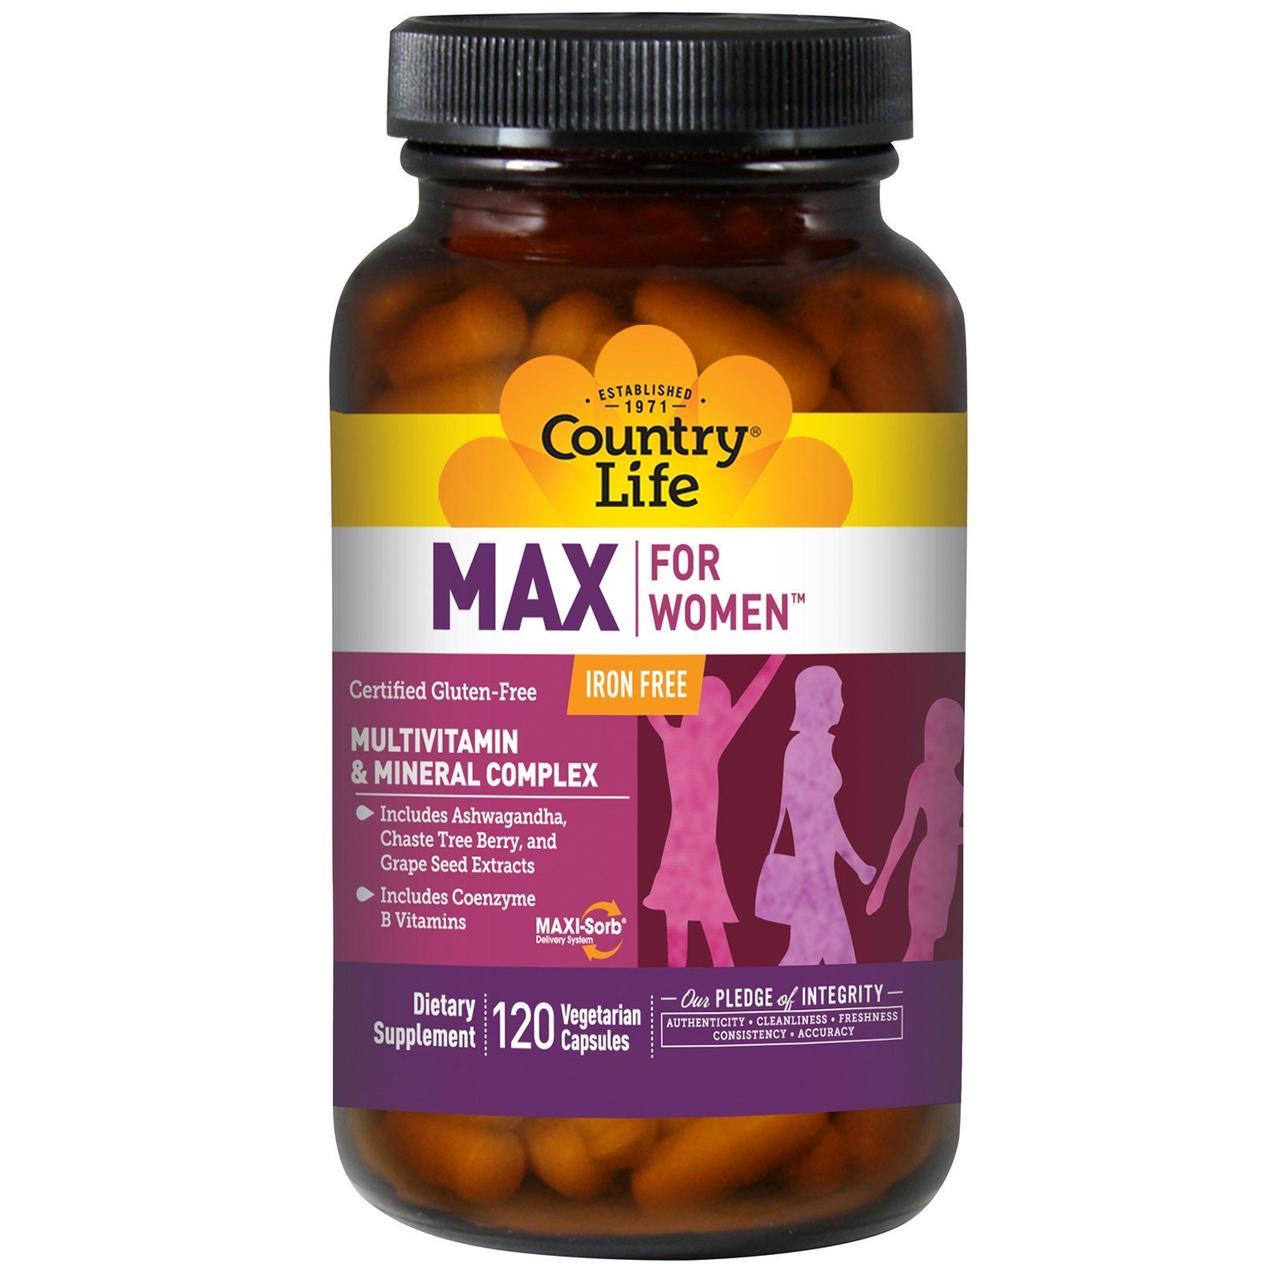 Мультивитамины для женщин, Multivitamin & Mineral, Country Life, 120 кап.